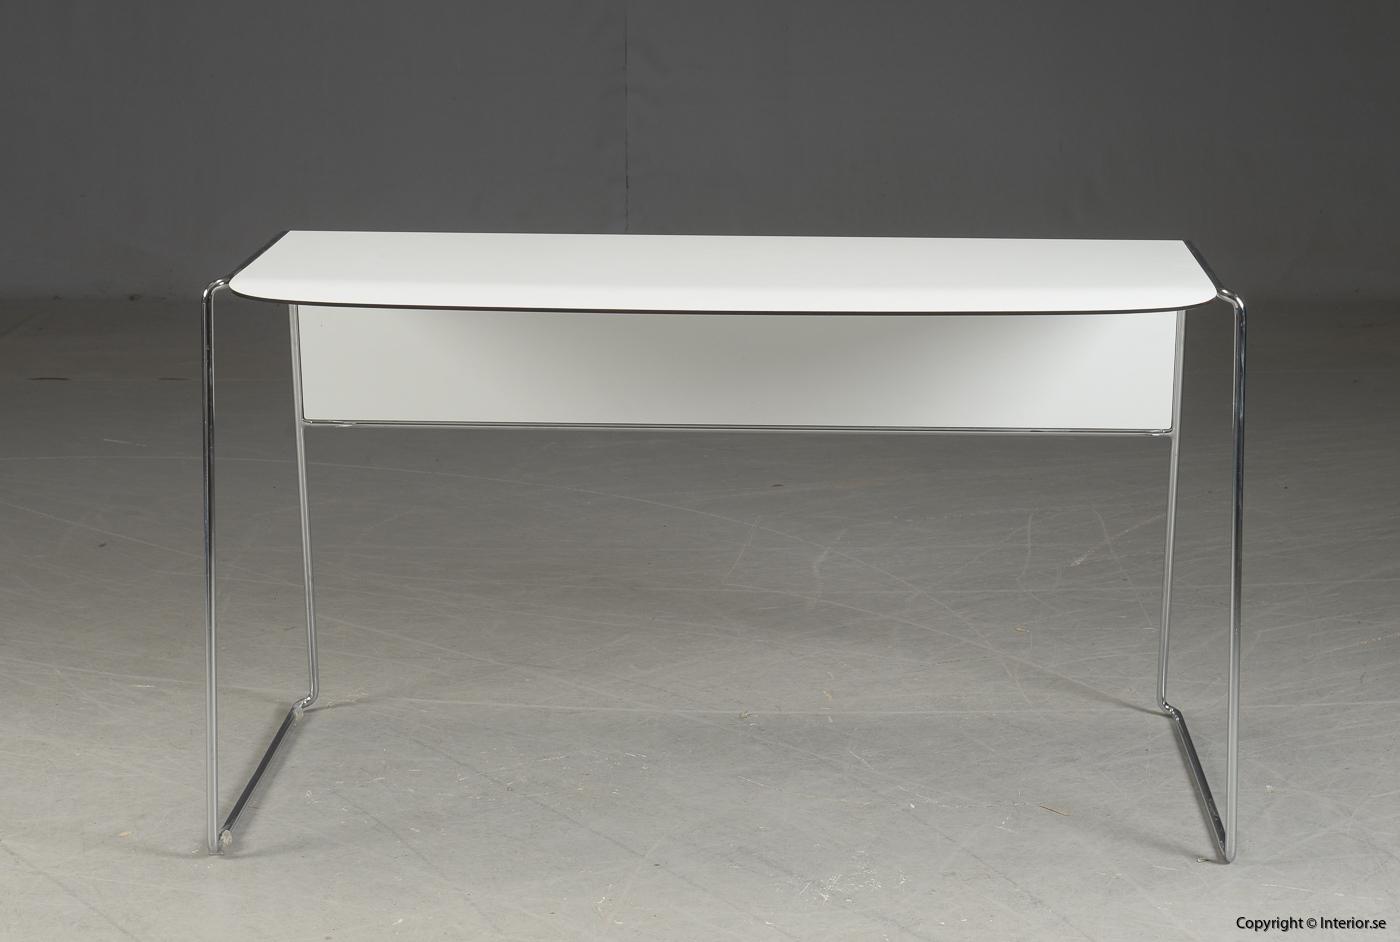 Skrivbord desk schreibtische, HOWE Tutor Dubbel - 123 cm  2